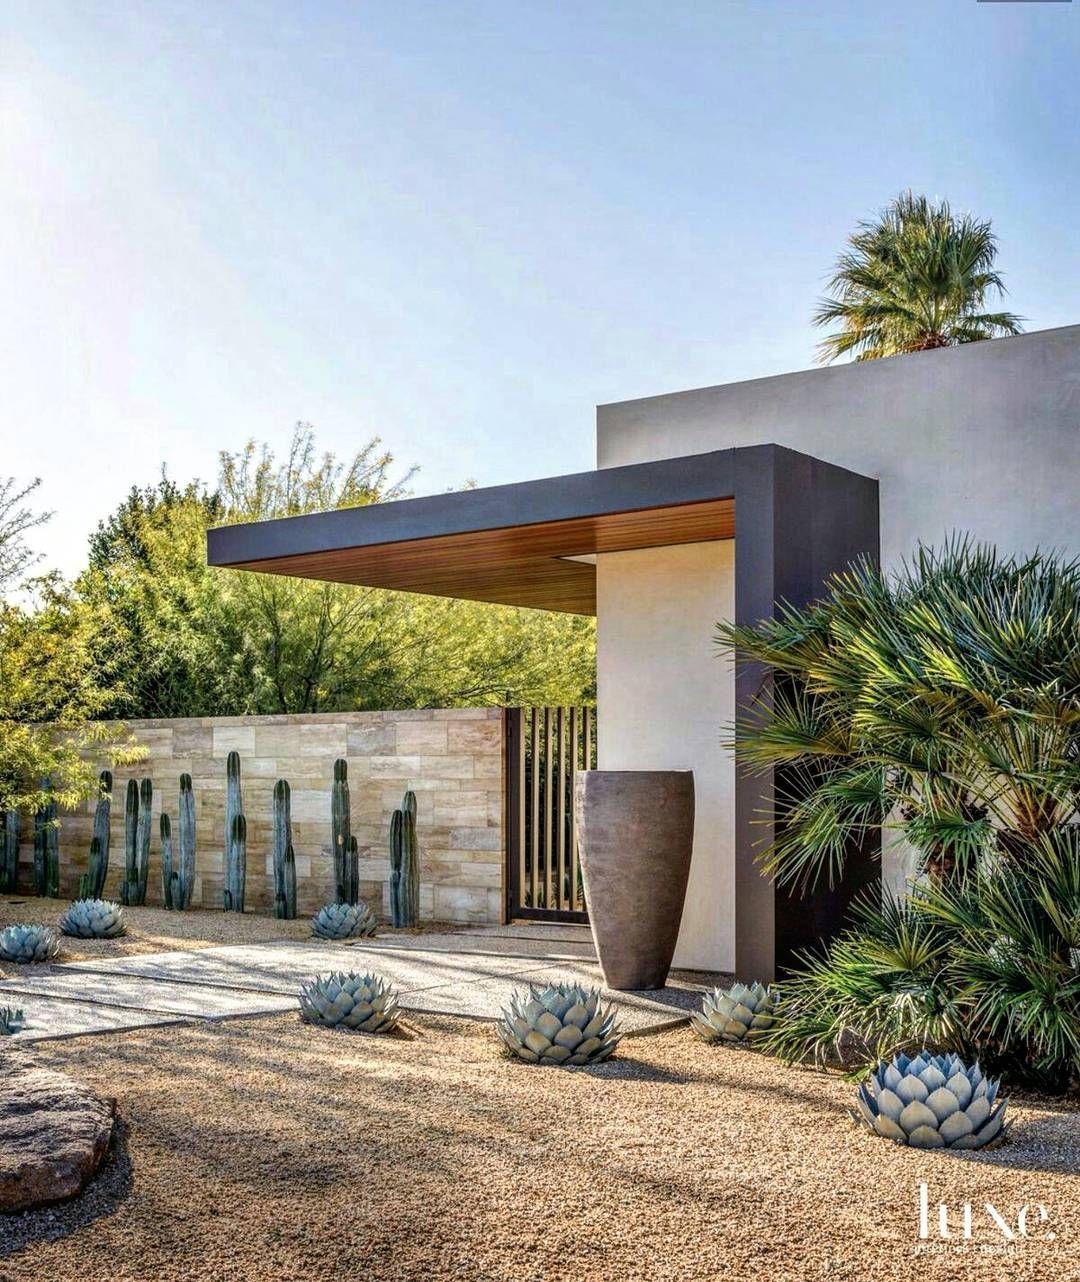 99 Magnificent Landscape Architecture Across The World Part 2 Modern Architecture Modern Landscape Design Desert Homes